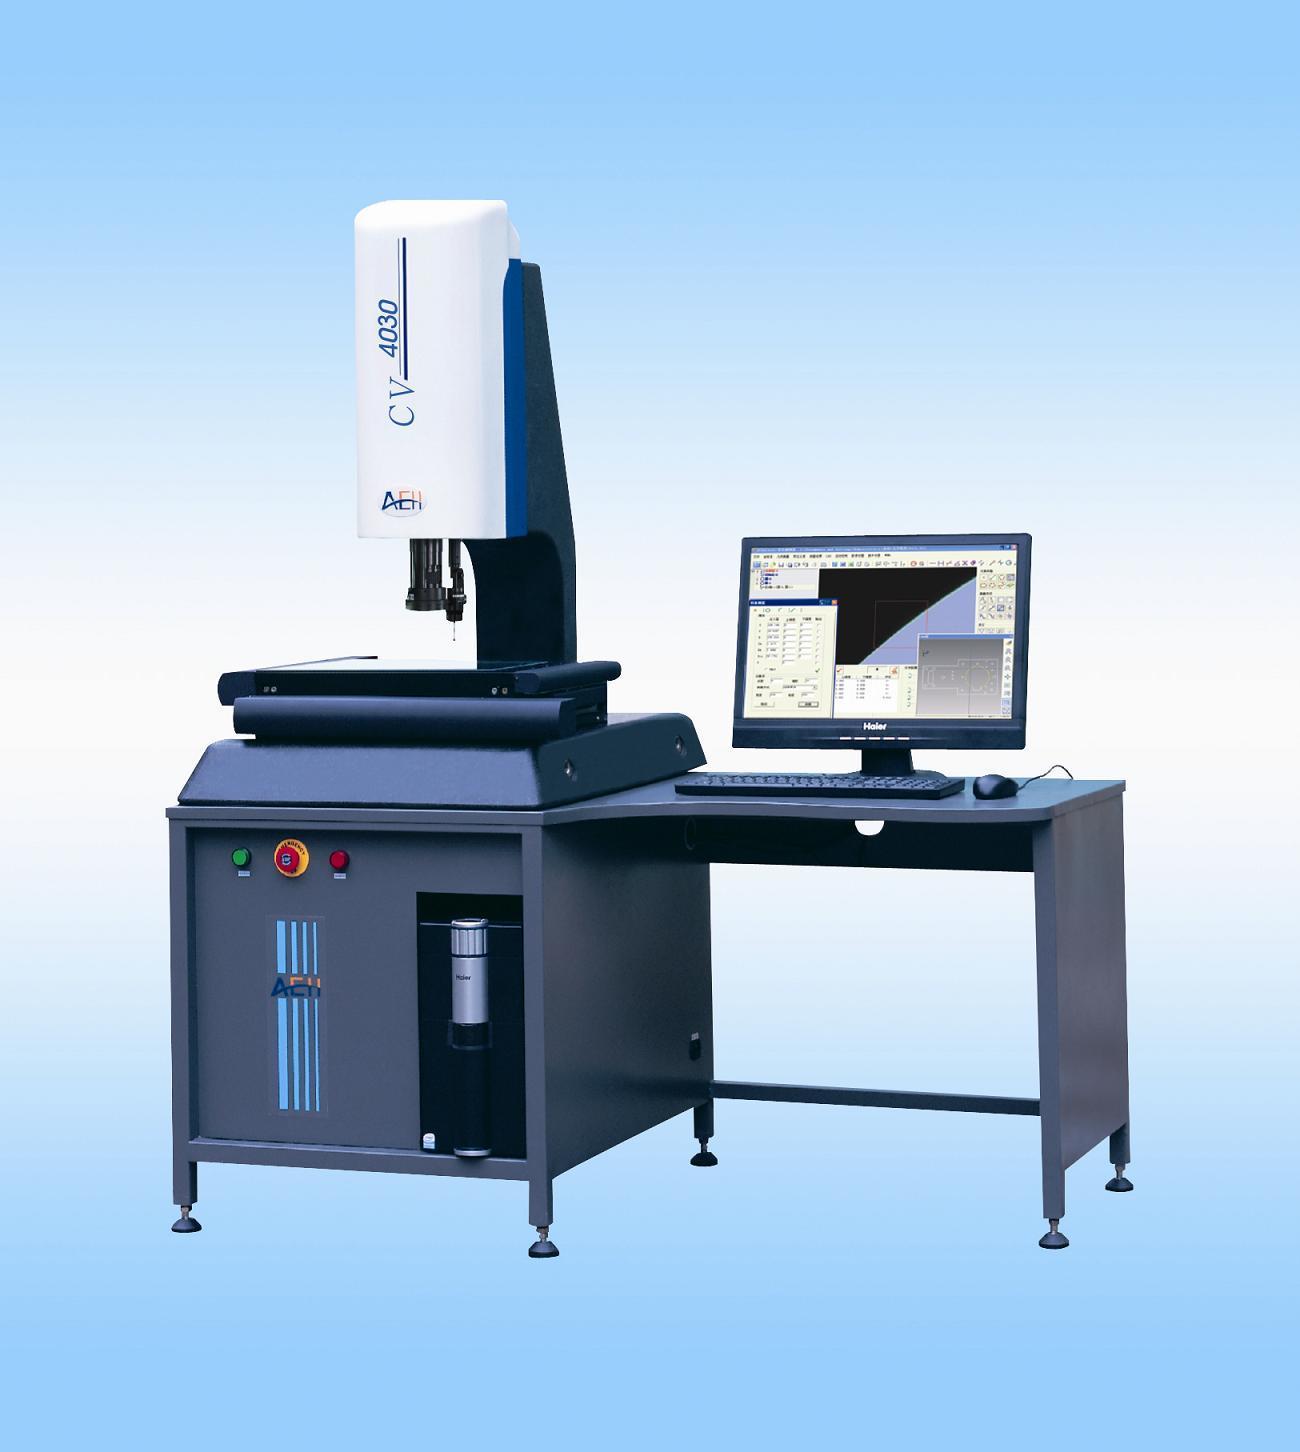 Coordinate Measuring Machine : Cmm cv coordinate measuring machine images frompo